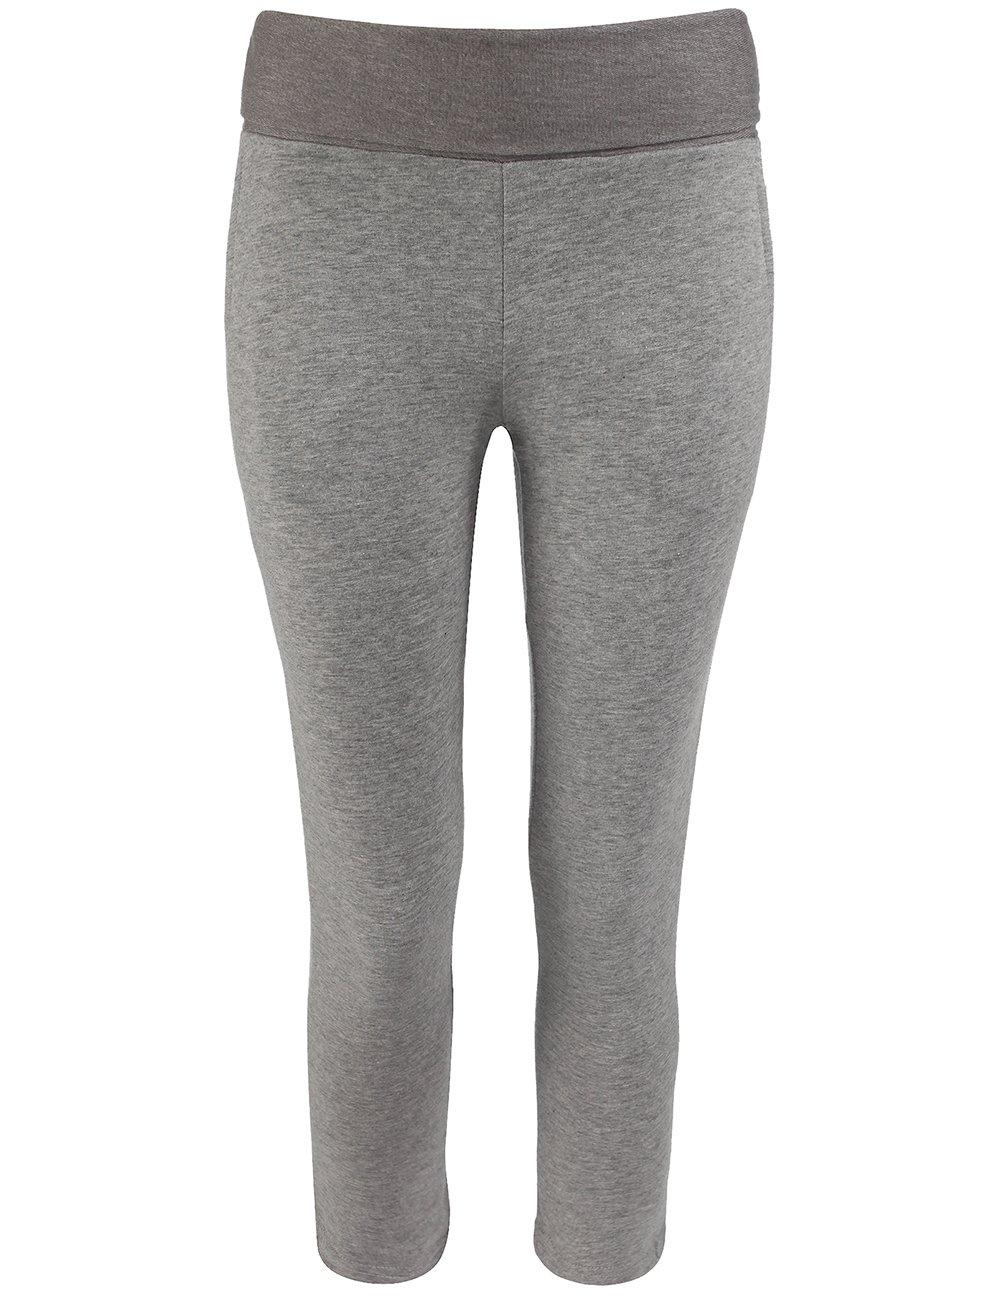 Bench Twopenny BGNK0216 Girls'Jogging Bottoms (Manufacturer Size: 13-14) B00RMXJO2SGrey Marl13-14